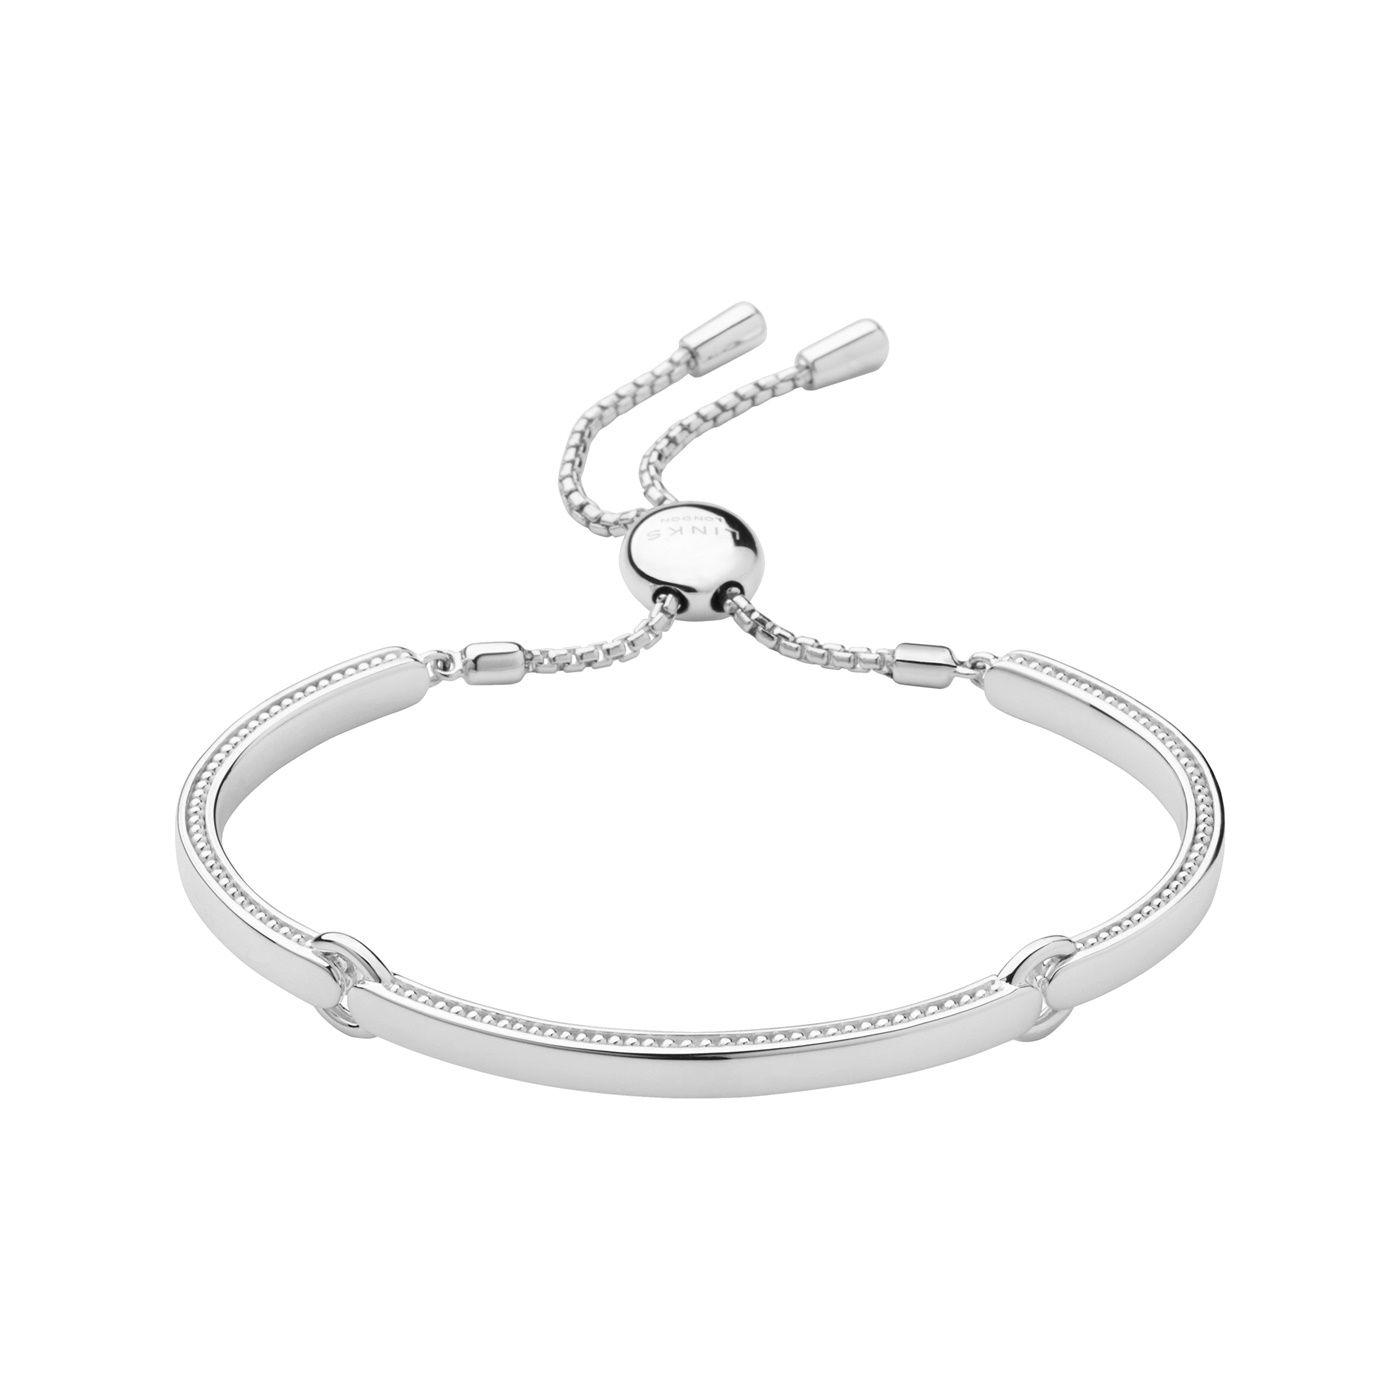 Narrative Sterling Silver Bracelet from Links of London  1b7367205